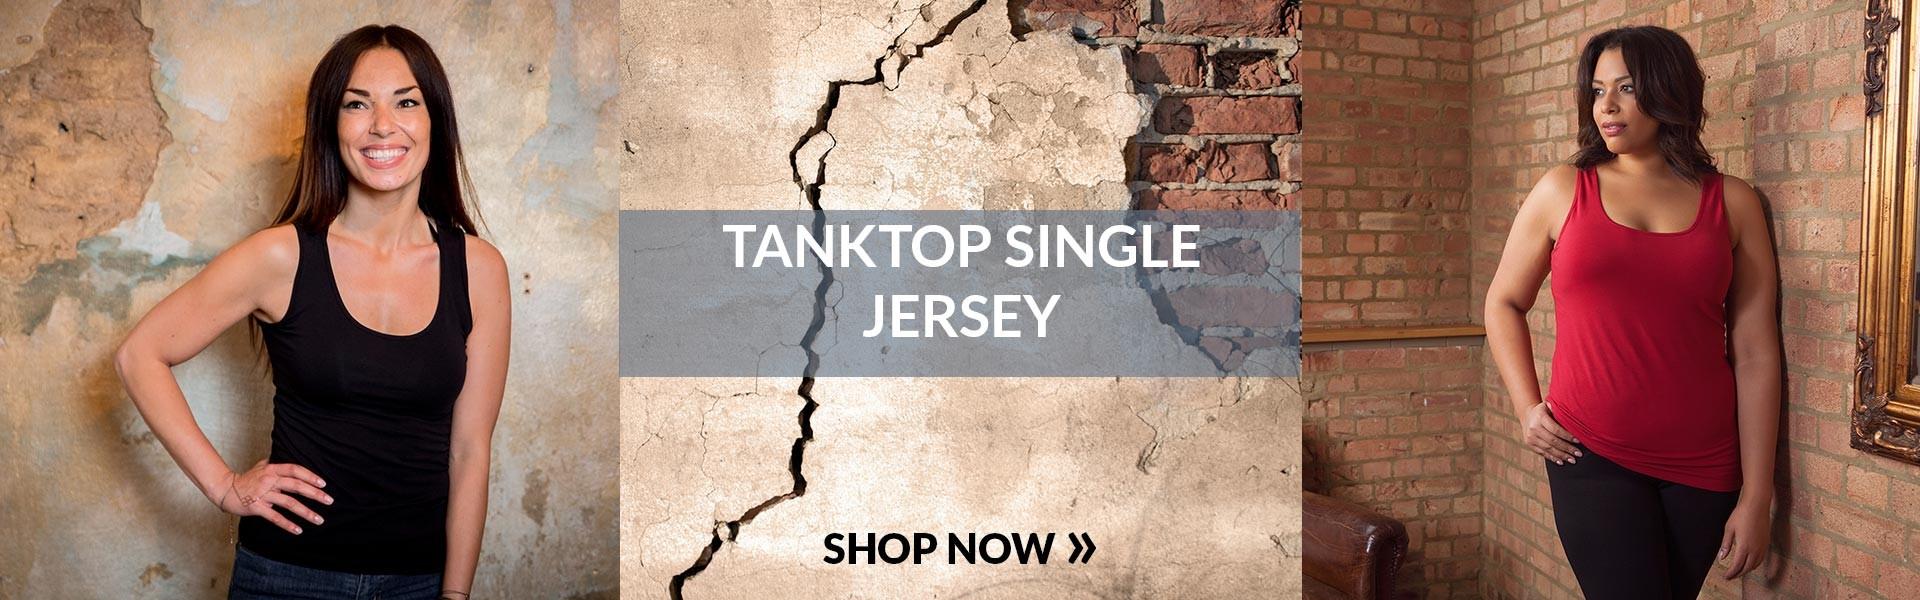 Women tanktops promodoro